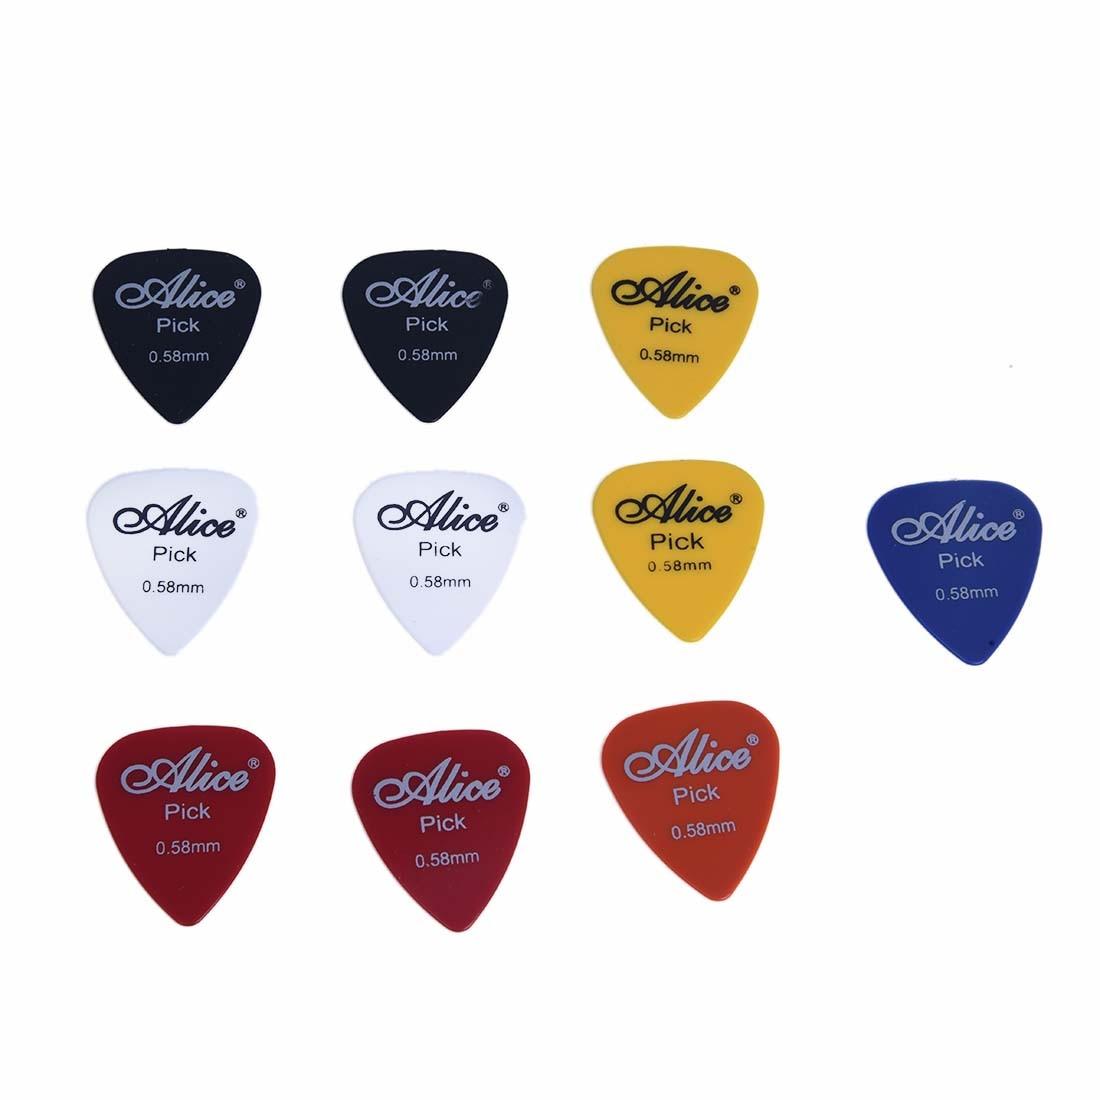 SEWS 10x Plectrum Guitar Accessories Alice Guitar Pick 0.58mm